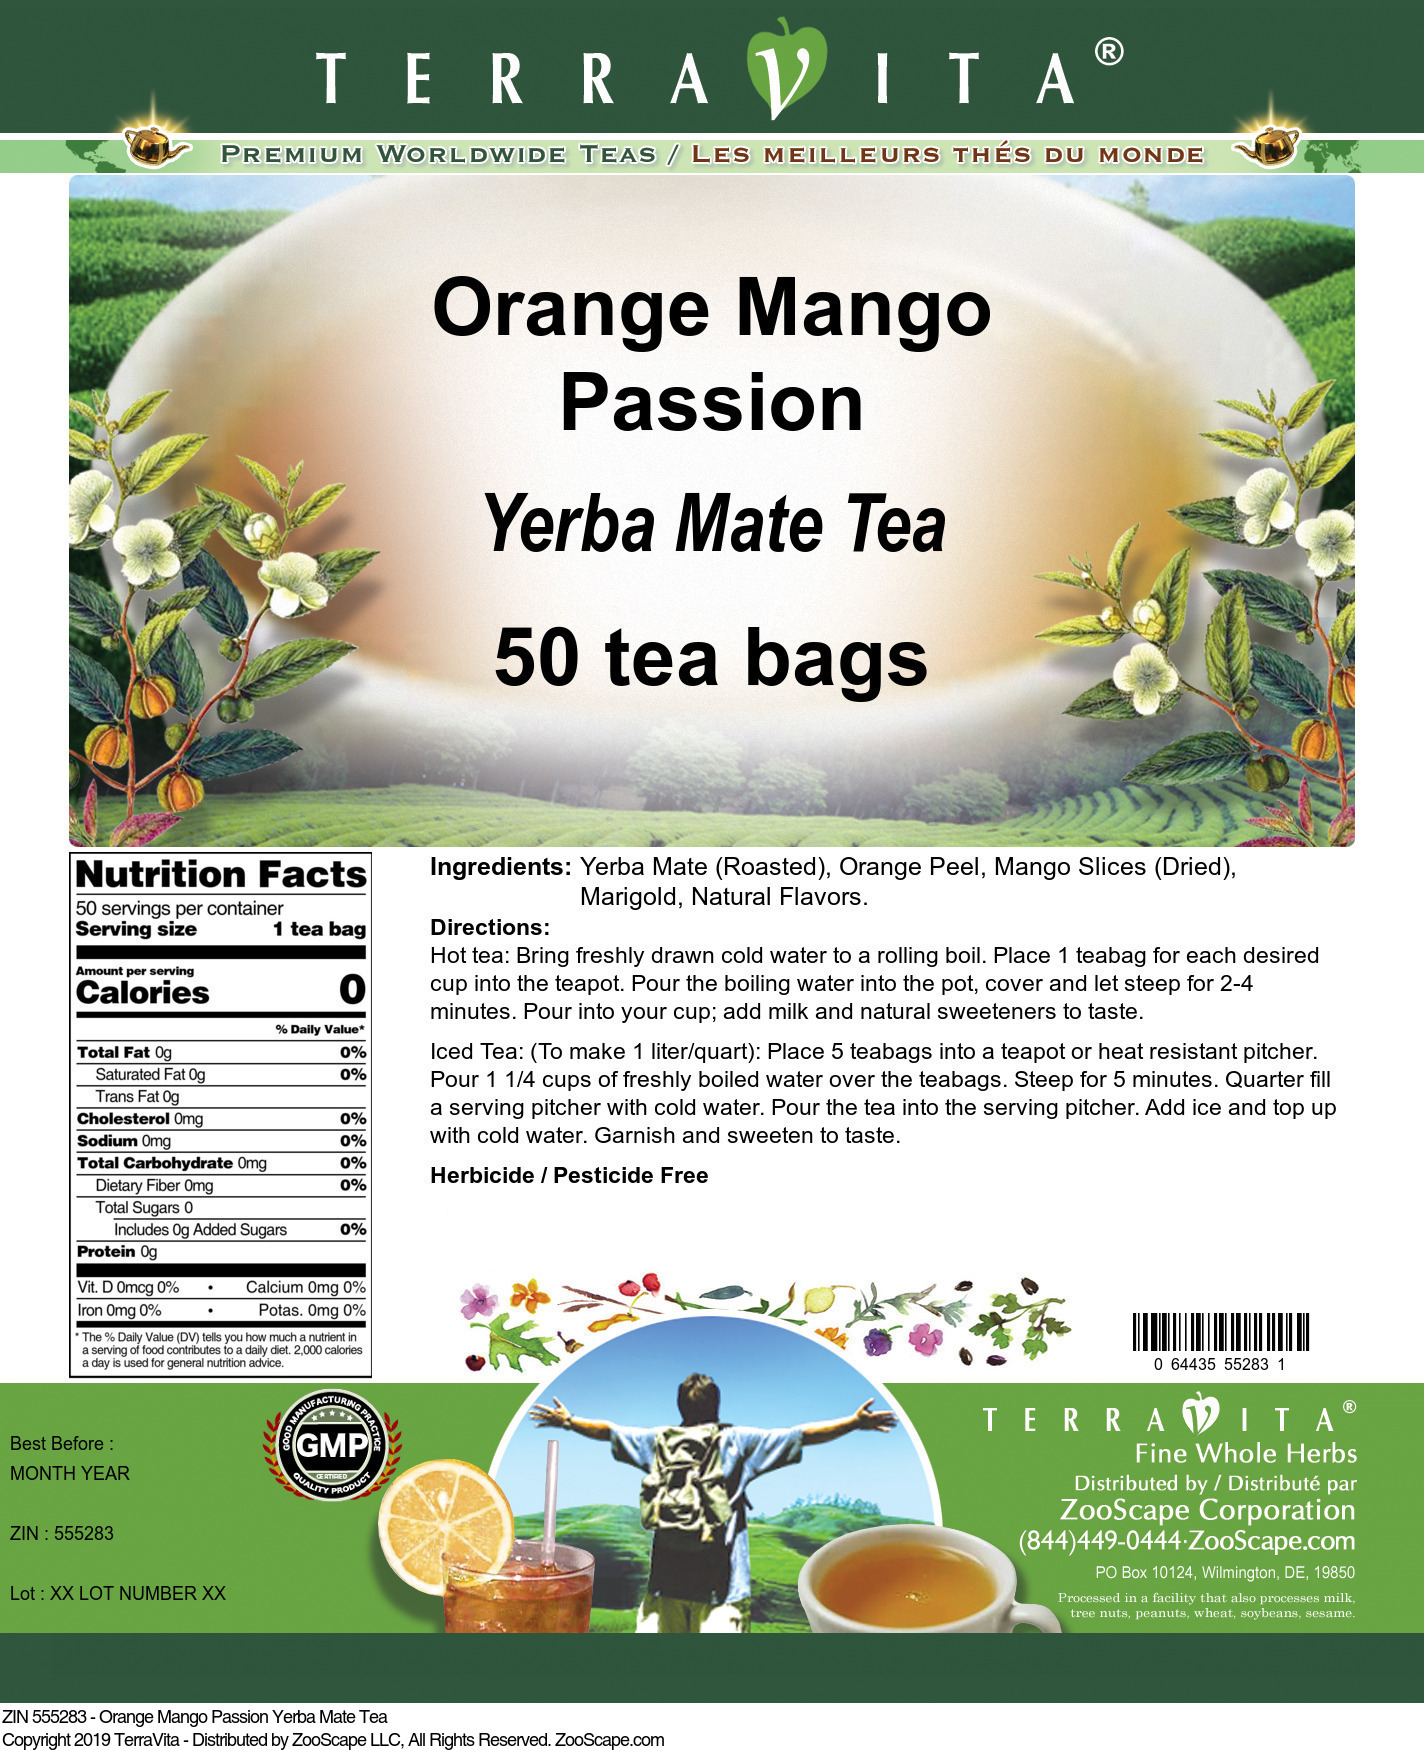 Orange Mango Passion Yerba Mate